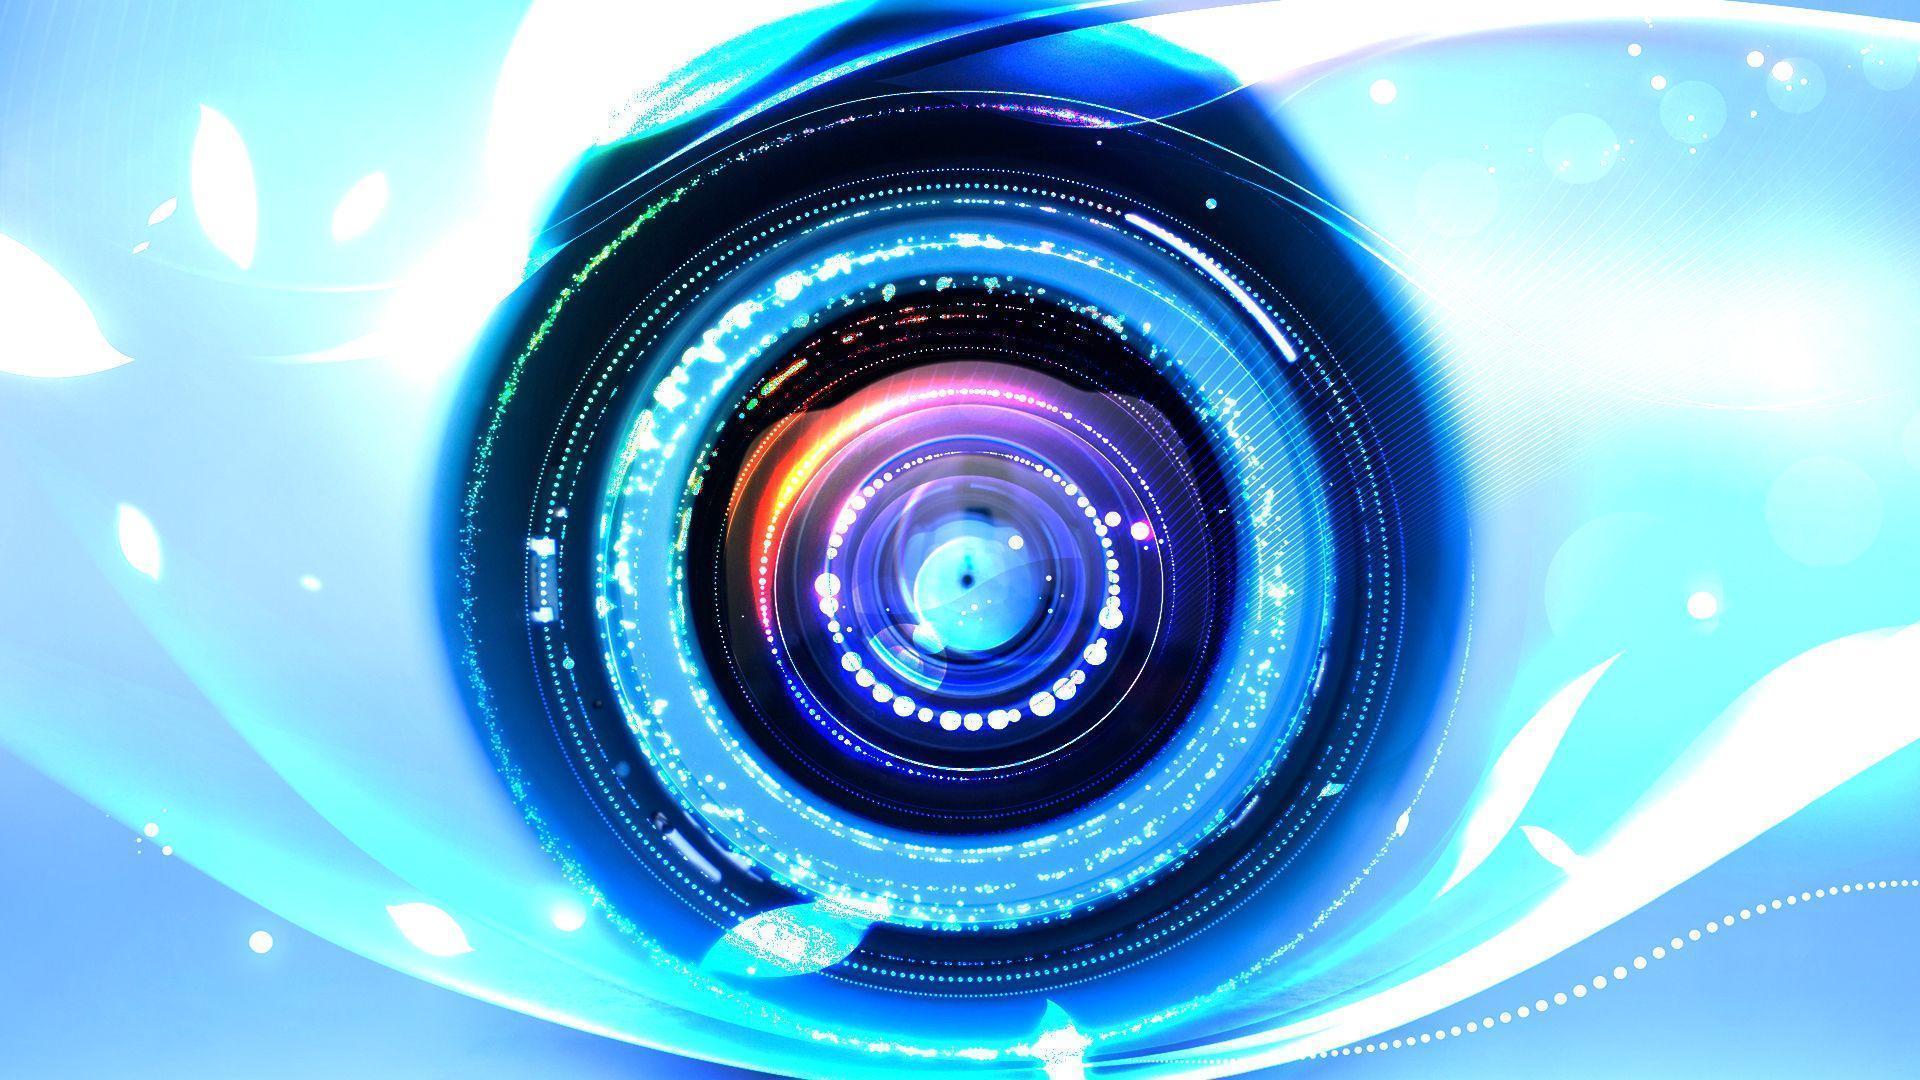 Big Lens High Res Stock Photos wallpaper | other | Wallpaper Better